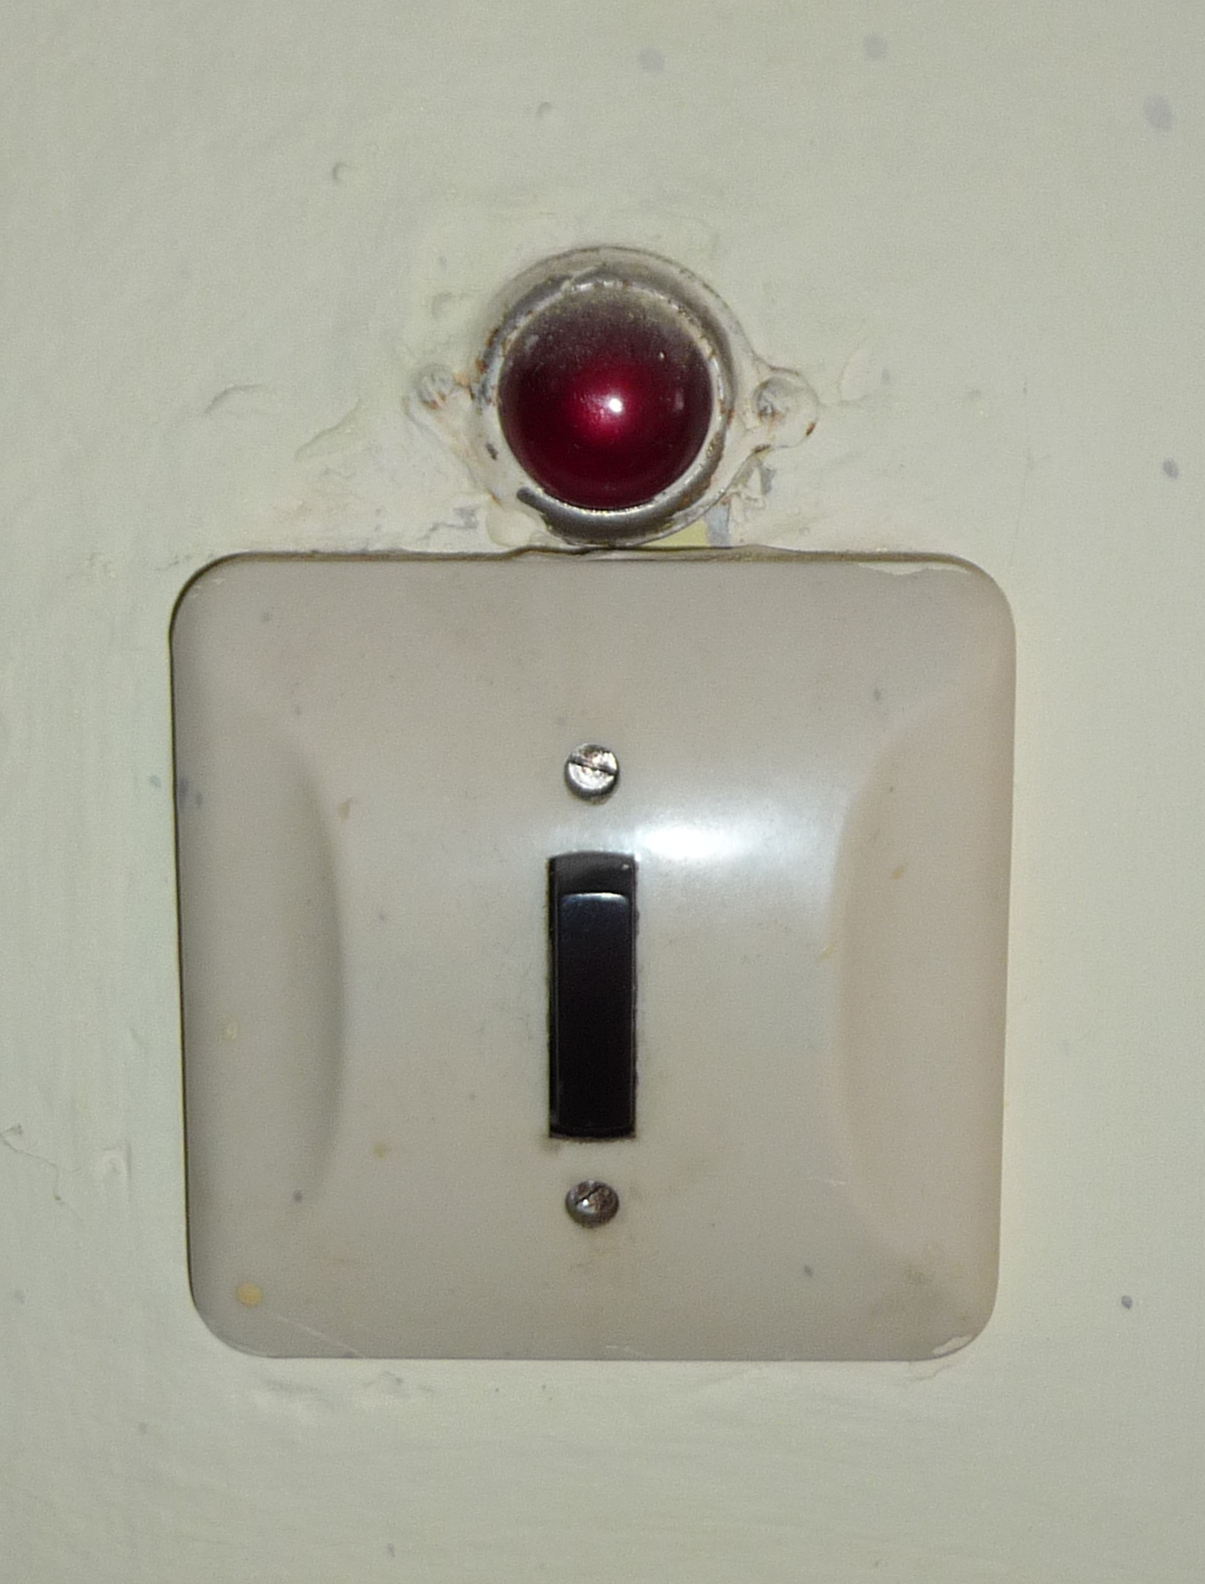 File:Czech old light switch.jpg - Wikimedia Commons